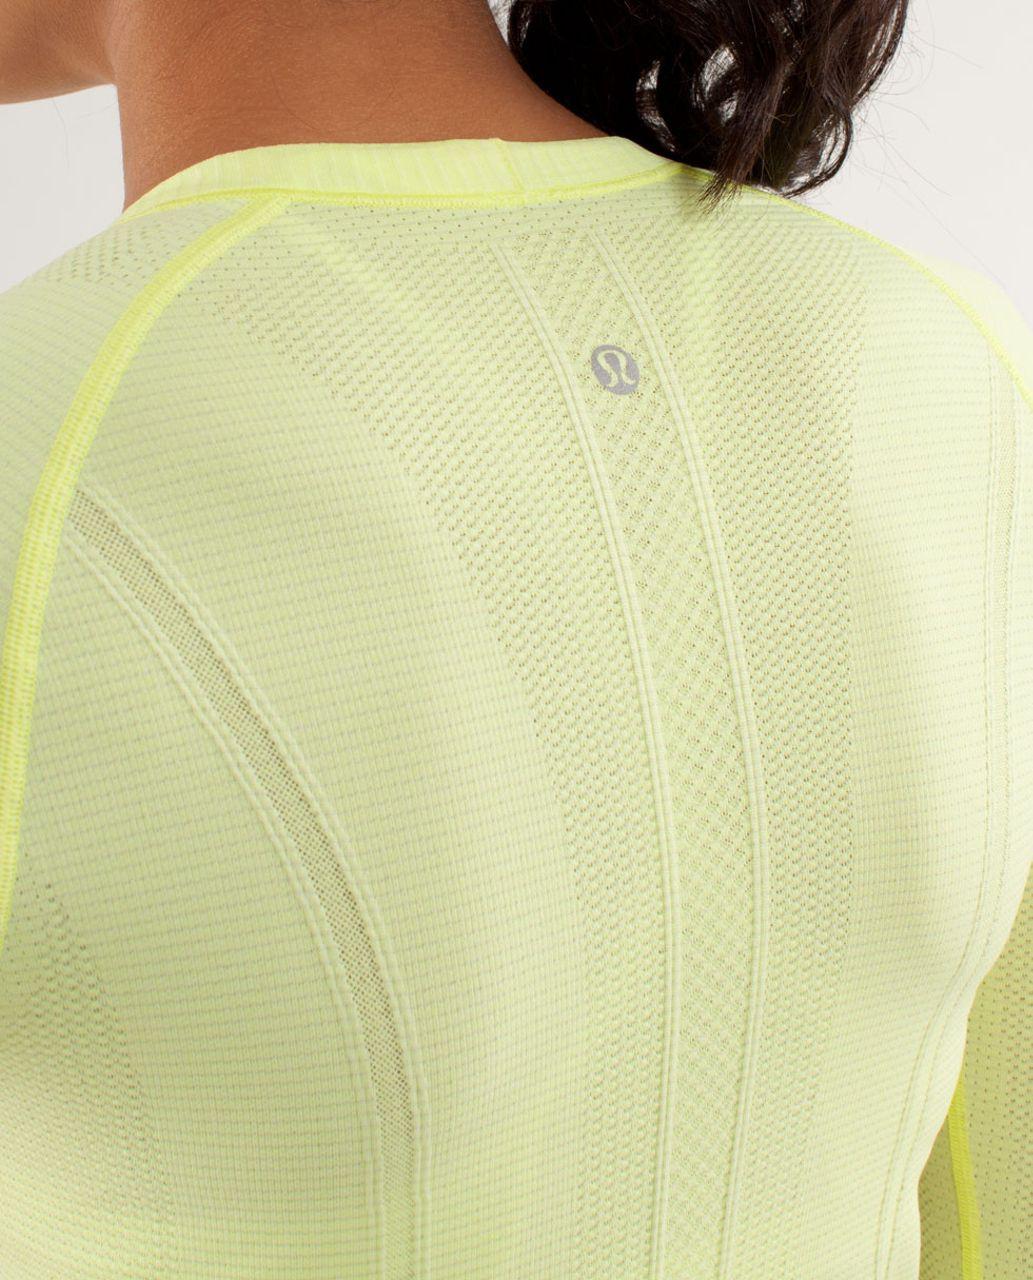 Lululemon Run:  Swiftly Tech Long Sleeve - Clarity Yellow / Inkwell